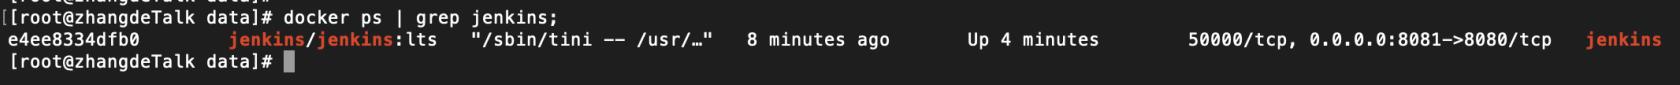 Docker 搭建 Jenkins 实现自动部署